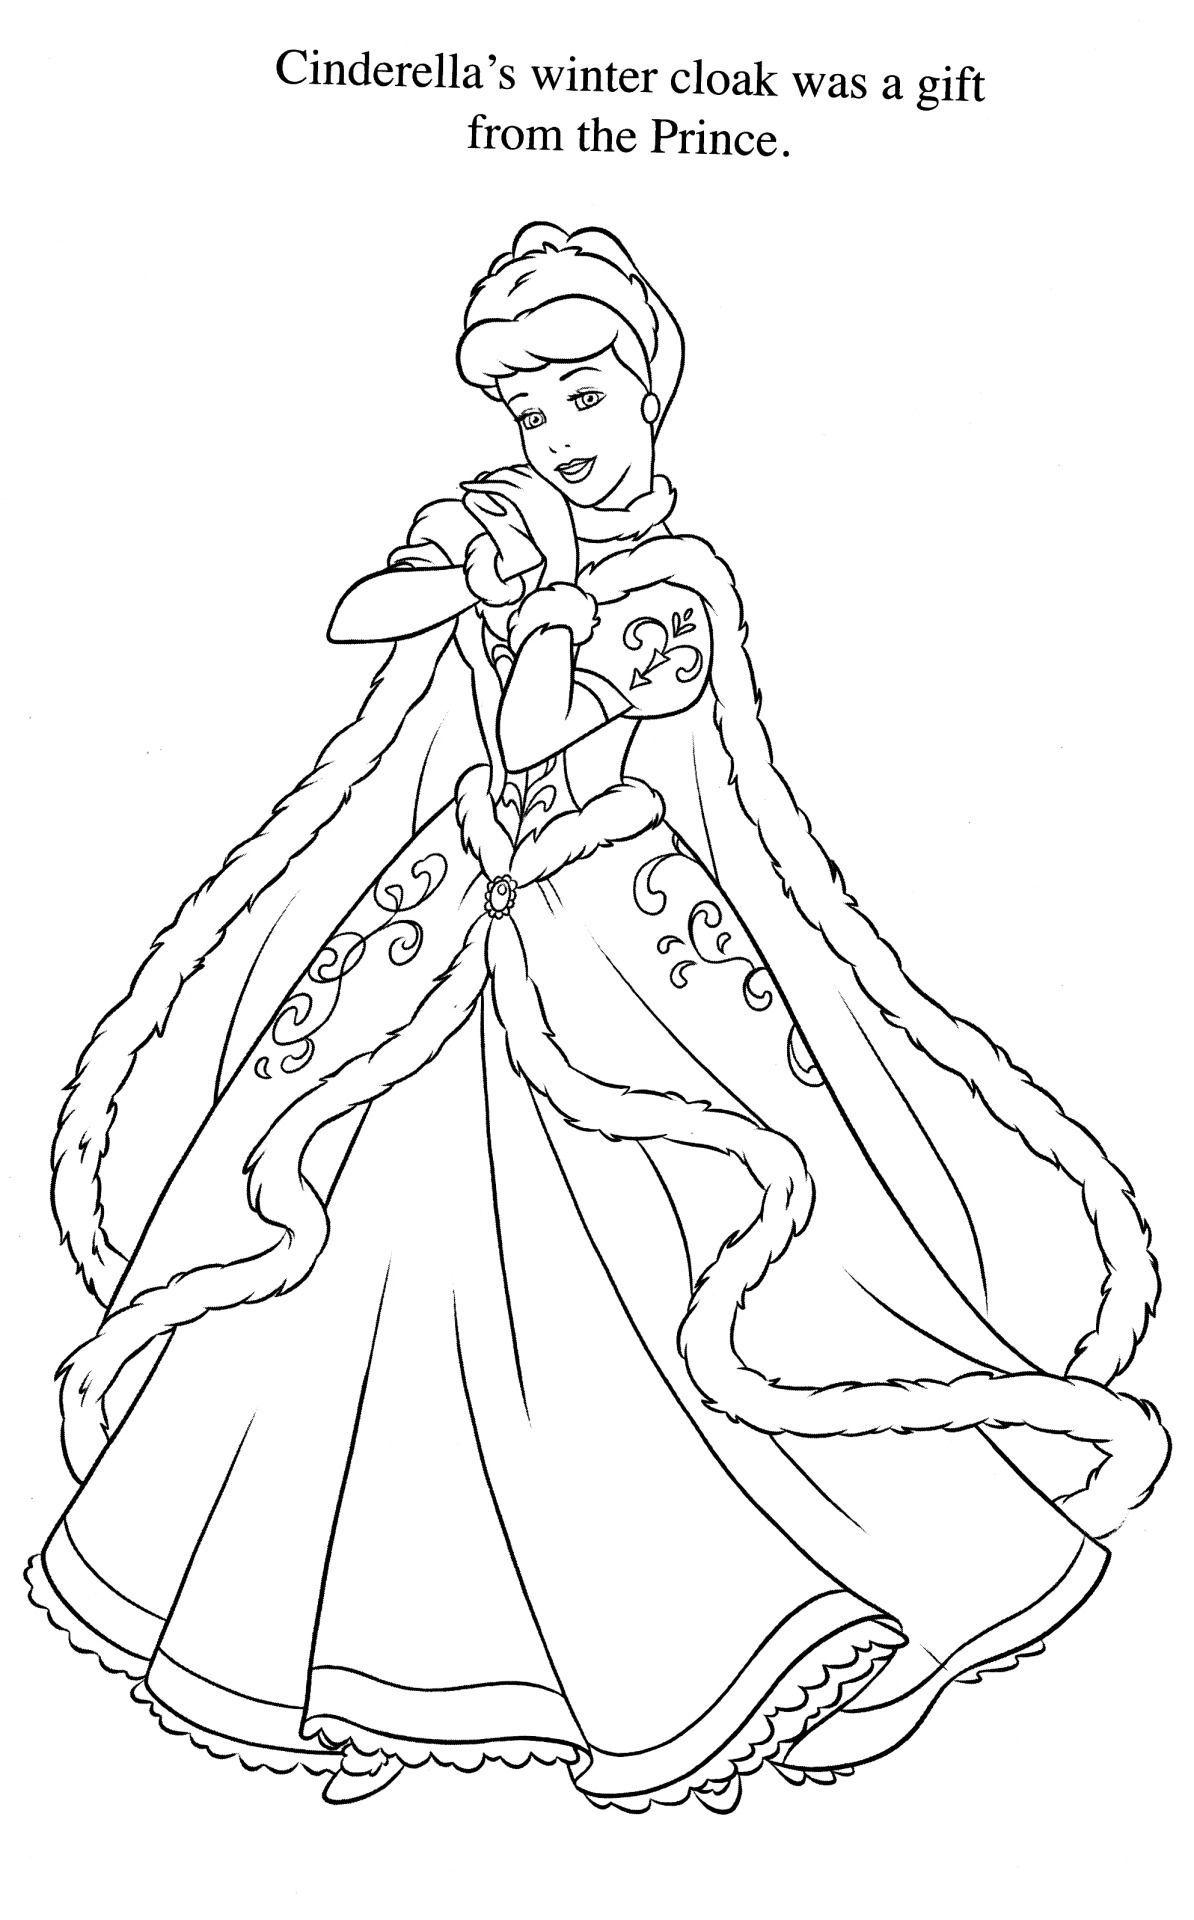 Disney Coloring Pages Color It Disney Coloring Pages Disney Princess Coloring Pages Cinderella Coloring Pages Disney Princess Colors